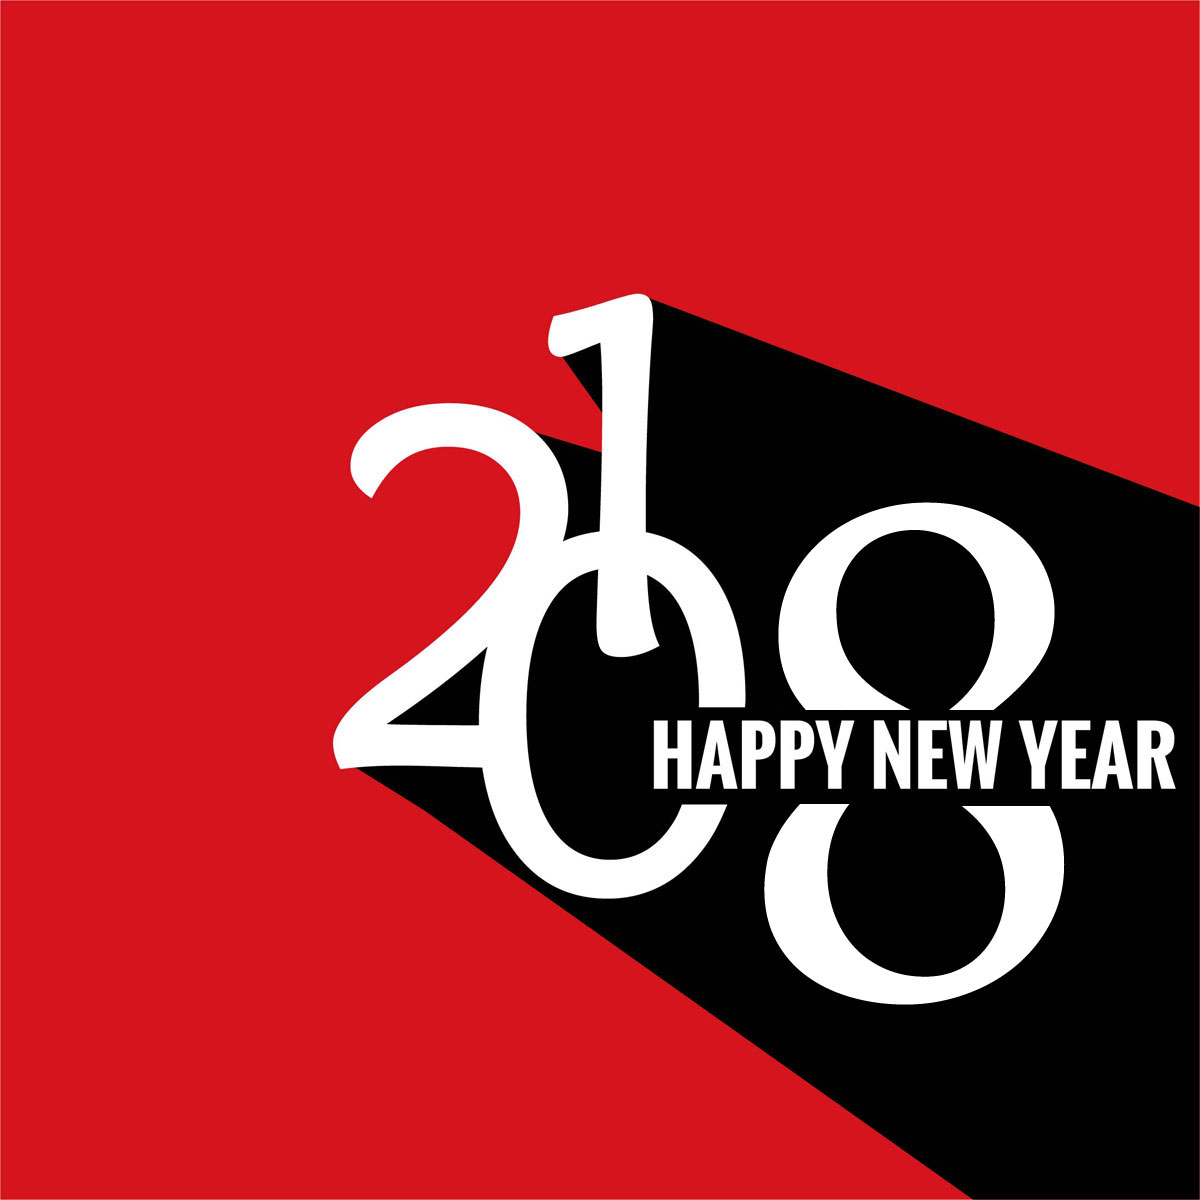 wallpaper happy new year 2019